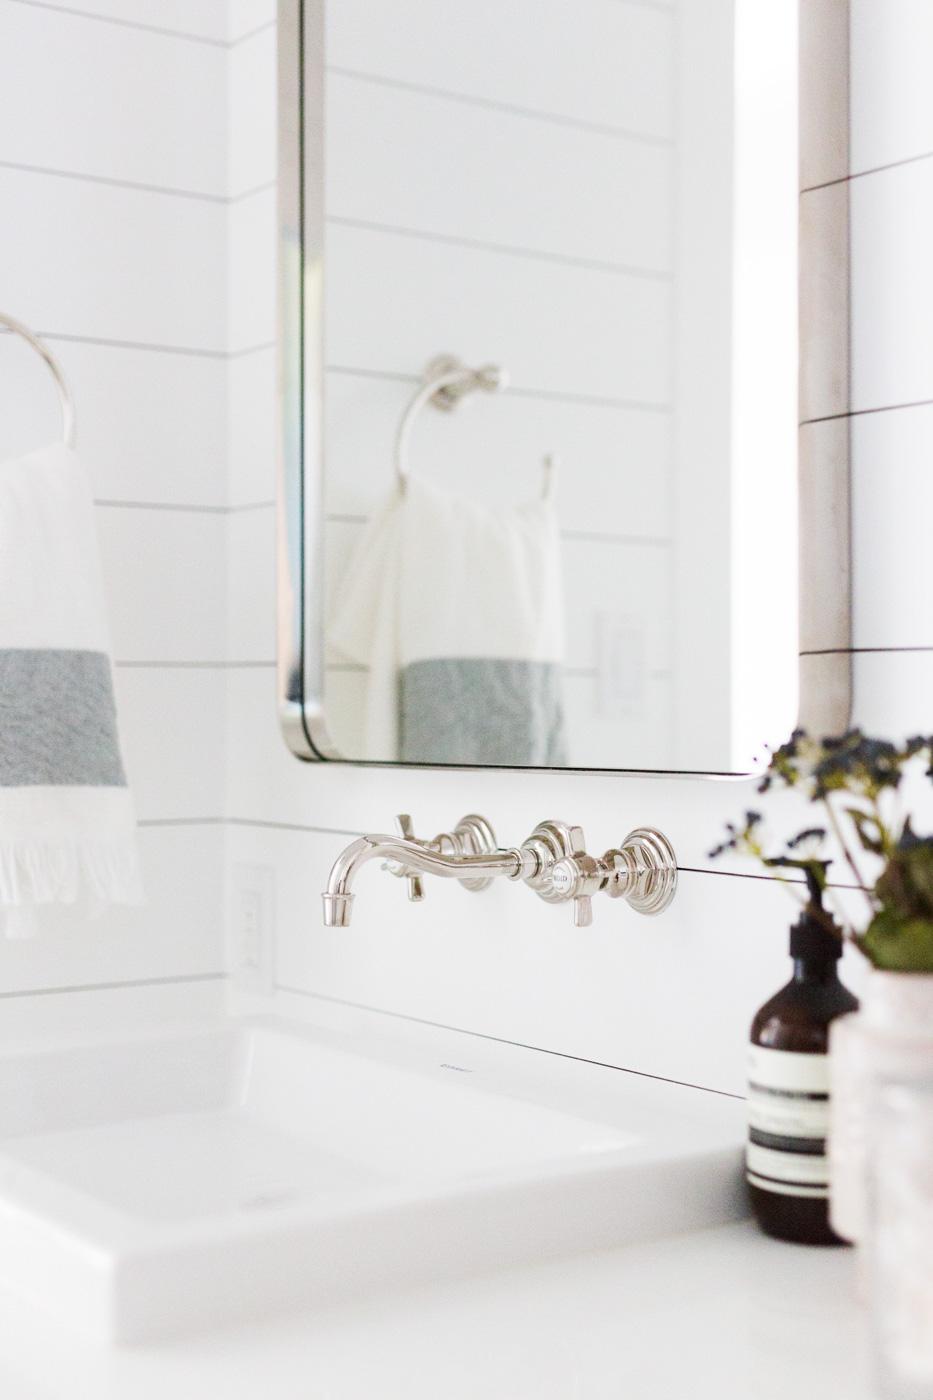 Wall-mounted+faucet+||+Studio+McGee.jpg